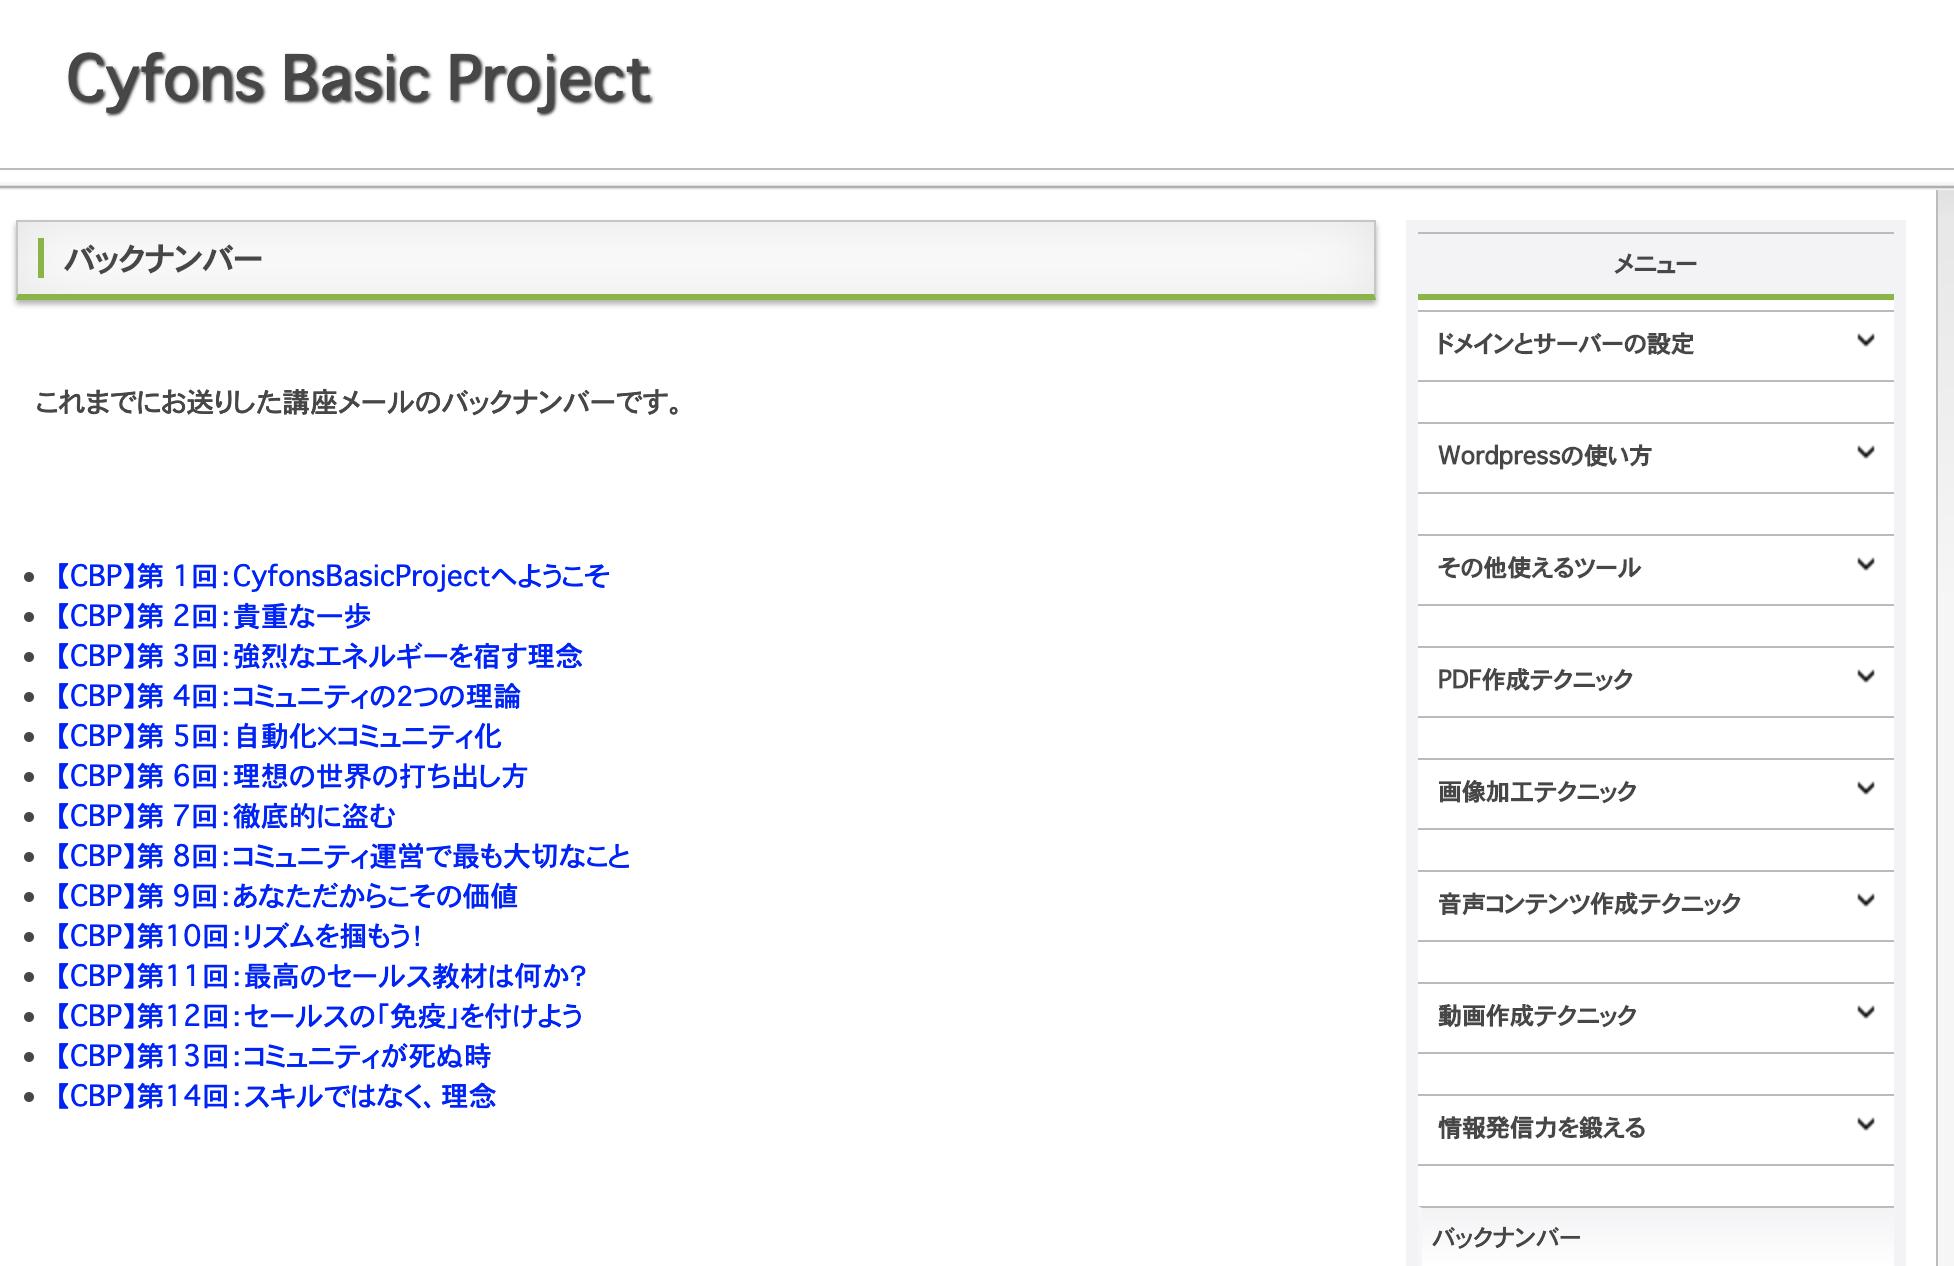 Cyfons Basic project